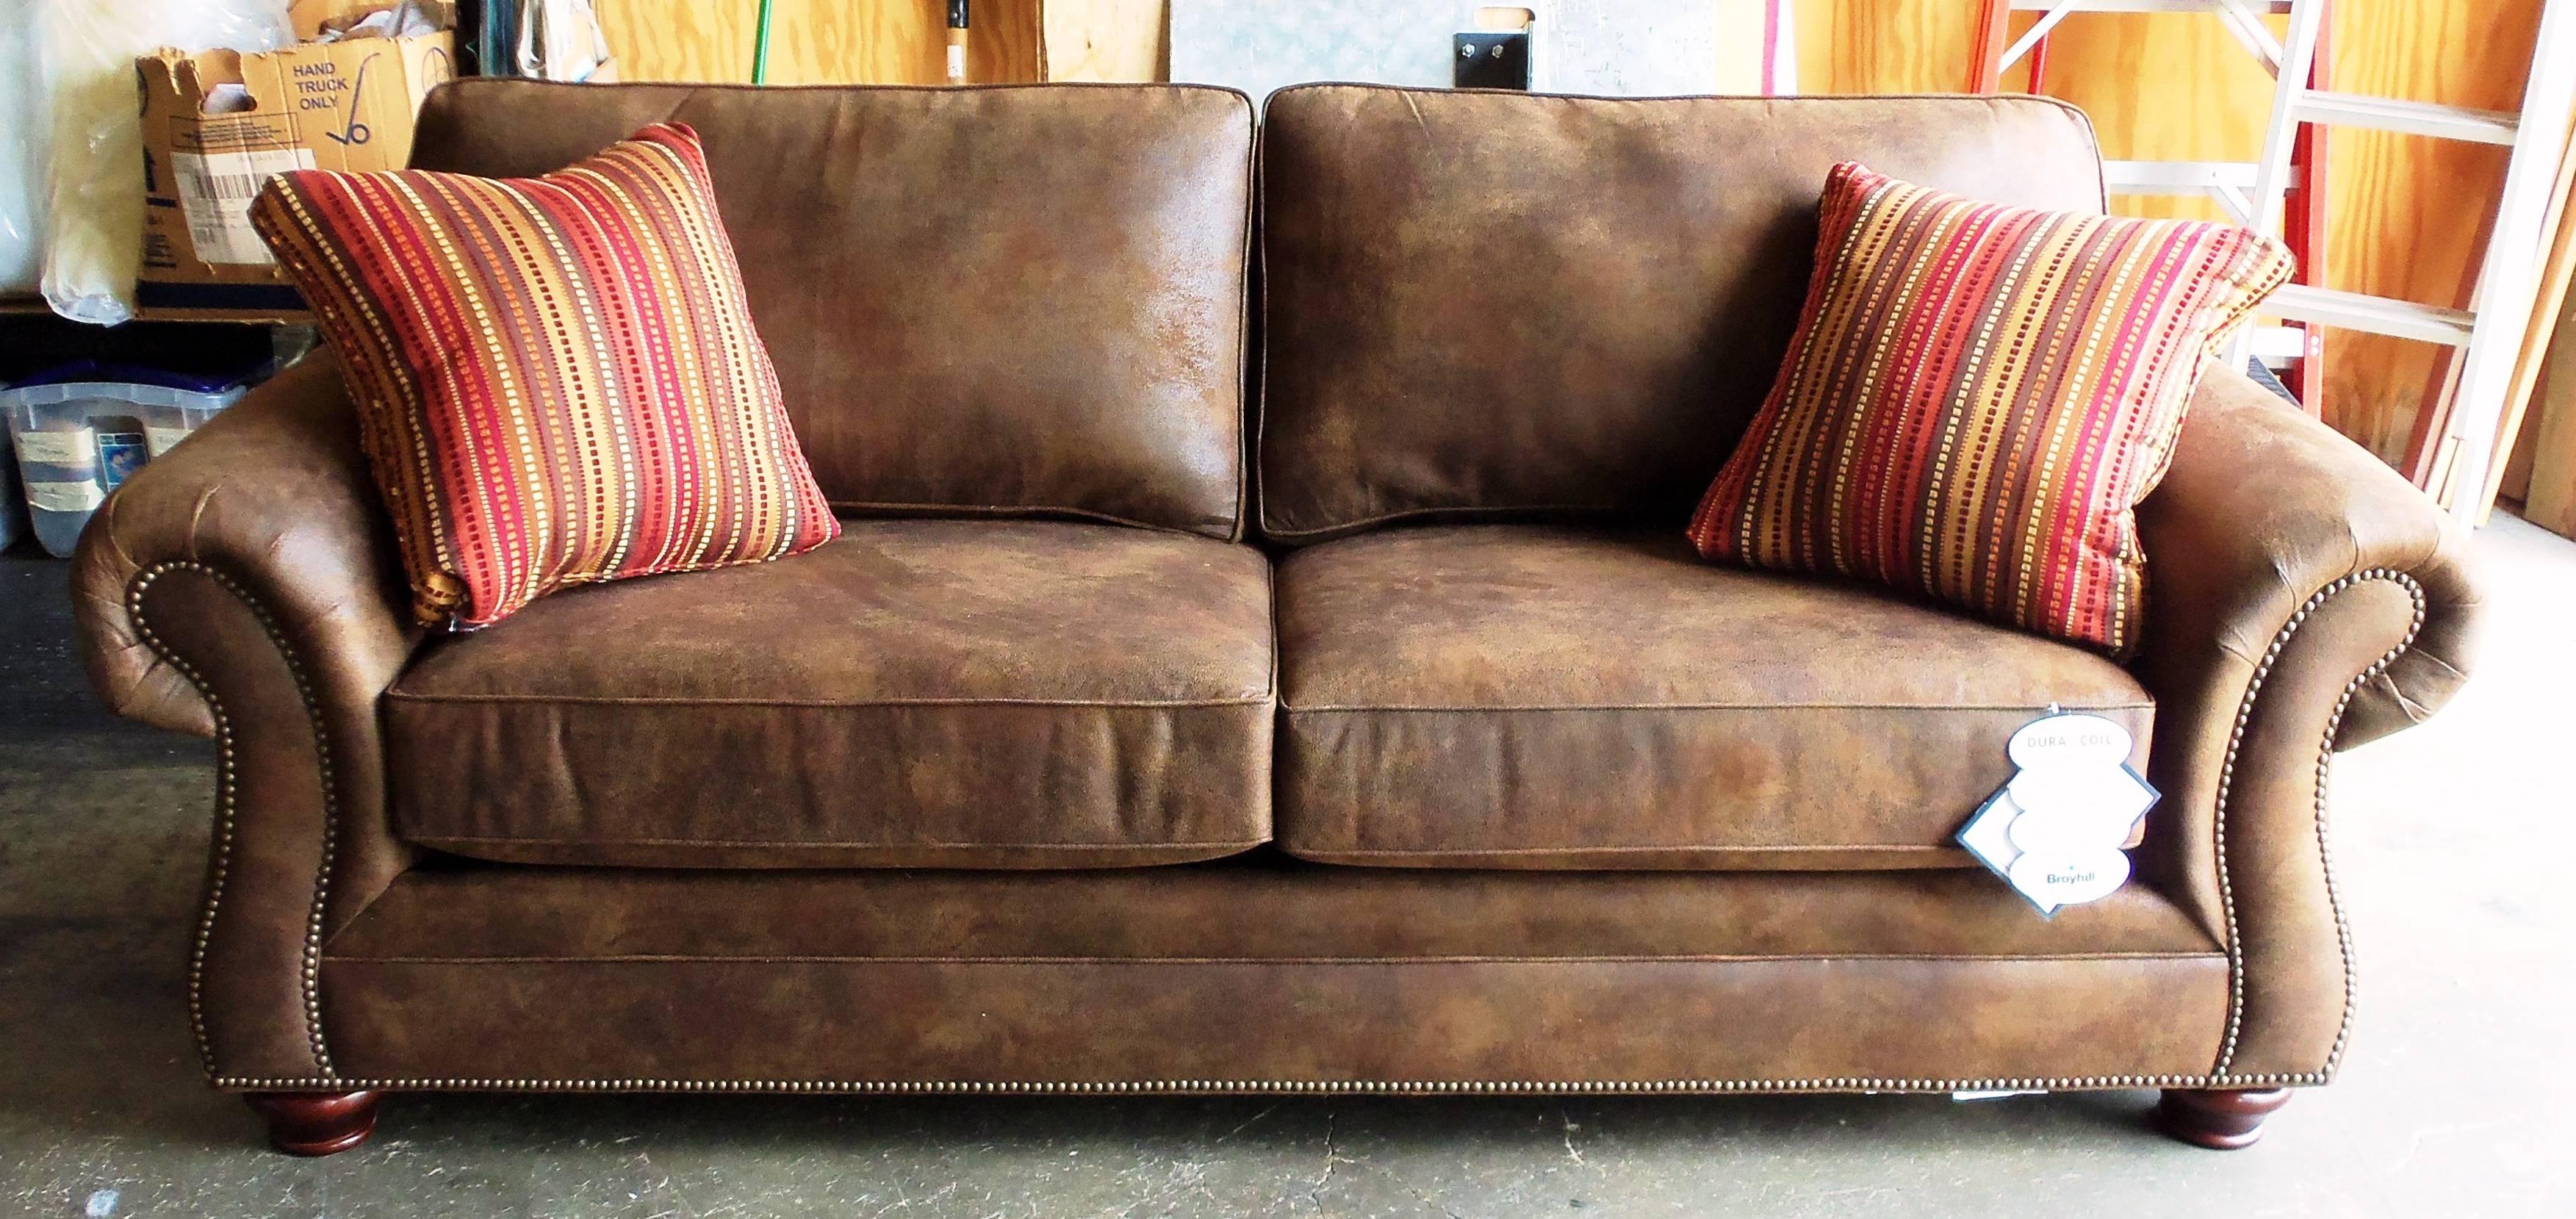 Furniture: Broyhill Furniture Canada | Broyhill Furniture Website regarding Broyhill Harrison Sofas (Image 9 of 15)